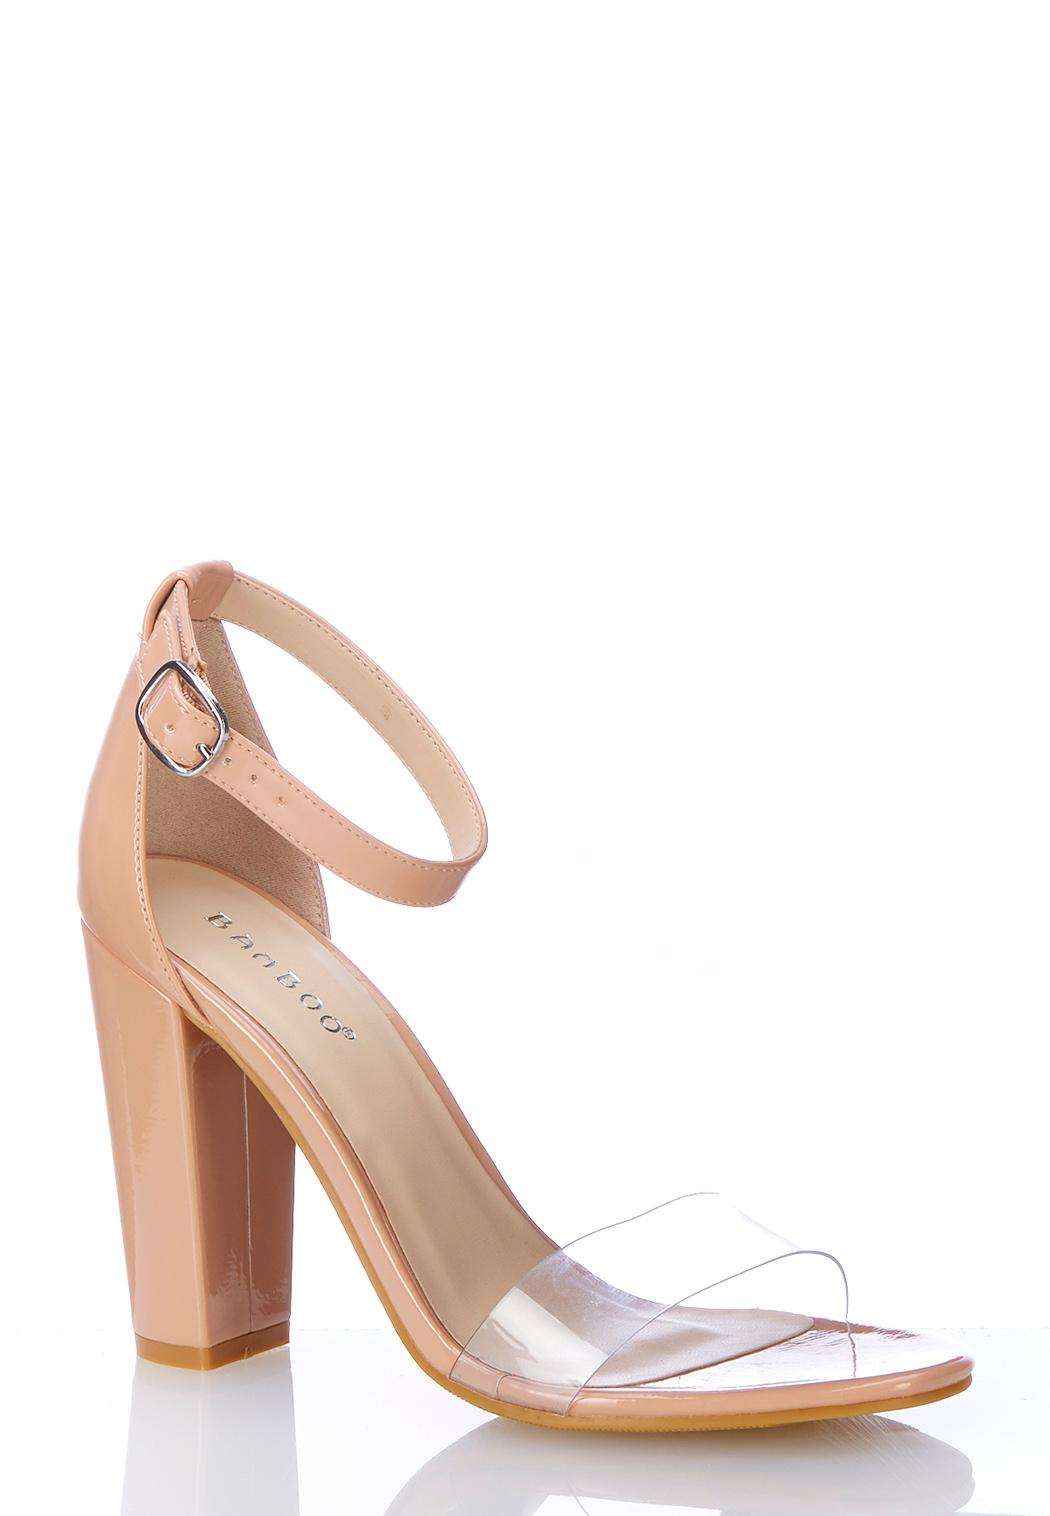 c79b33354d Lucite Strap Patent Heeled Sandals